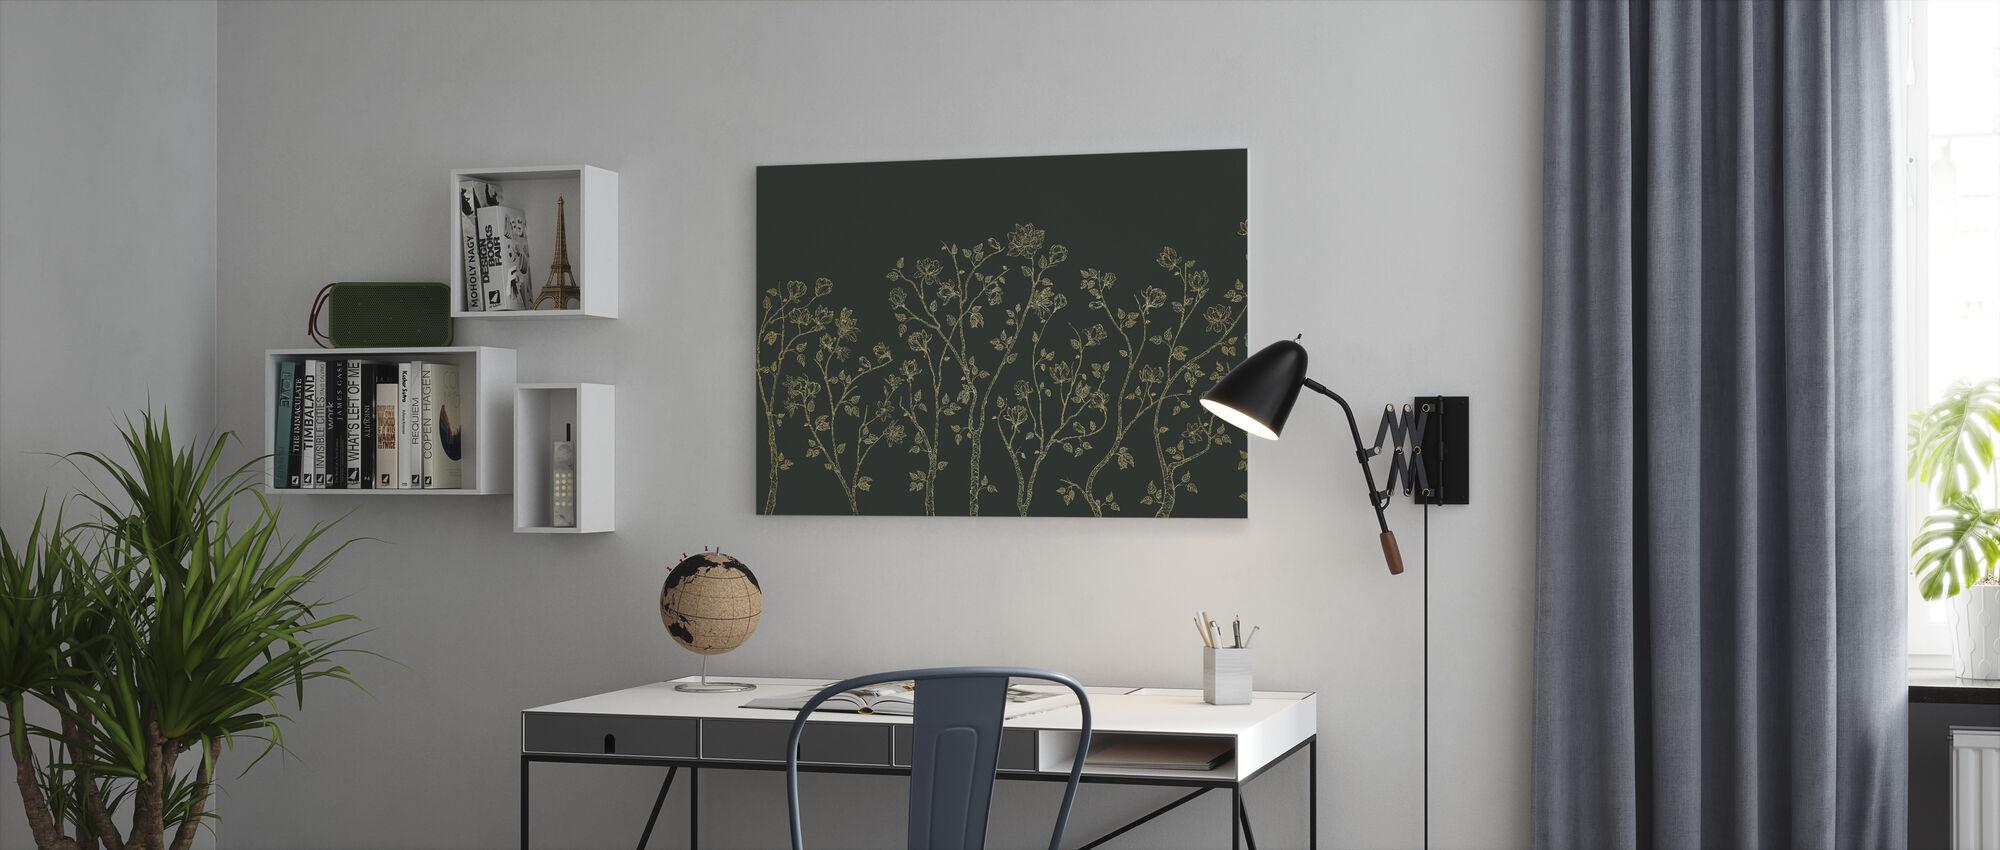 Crescent Vegetative - Green - Canvas print - Office